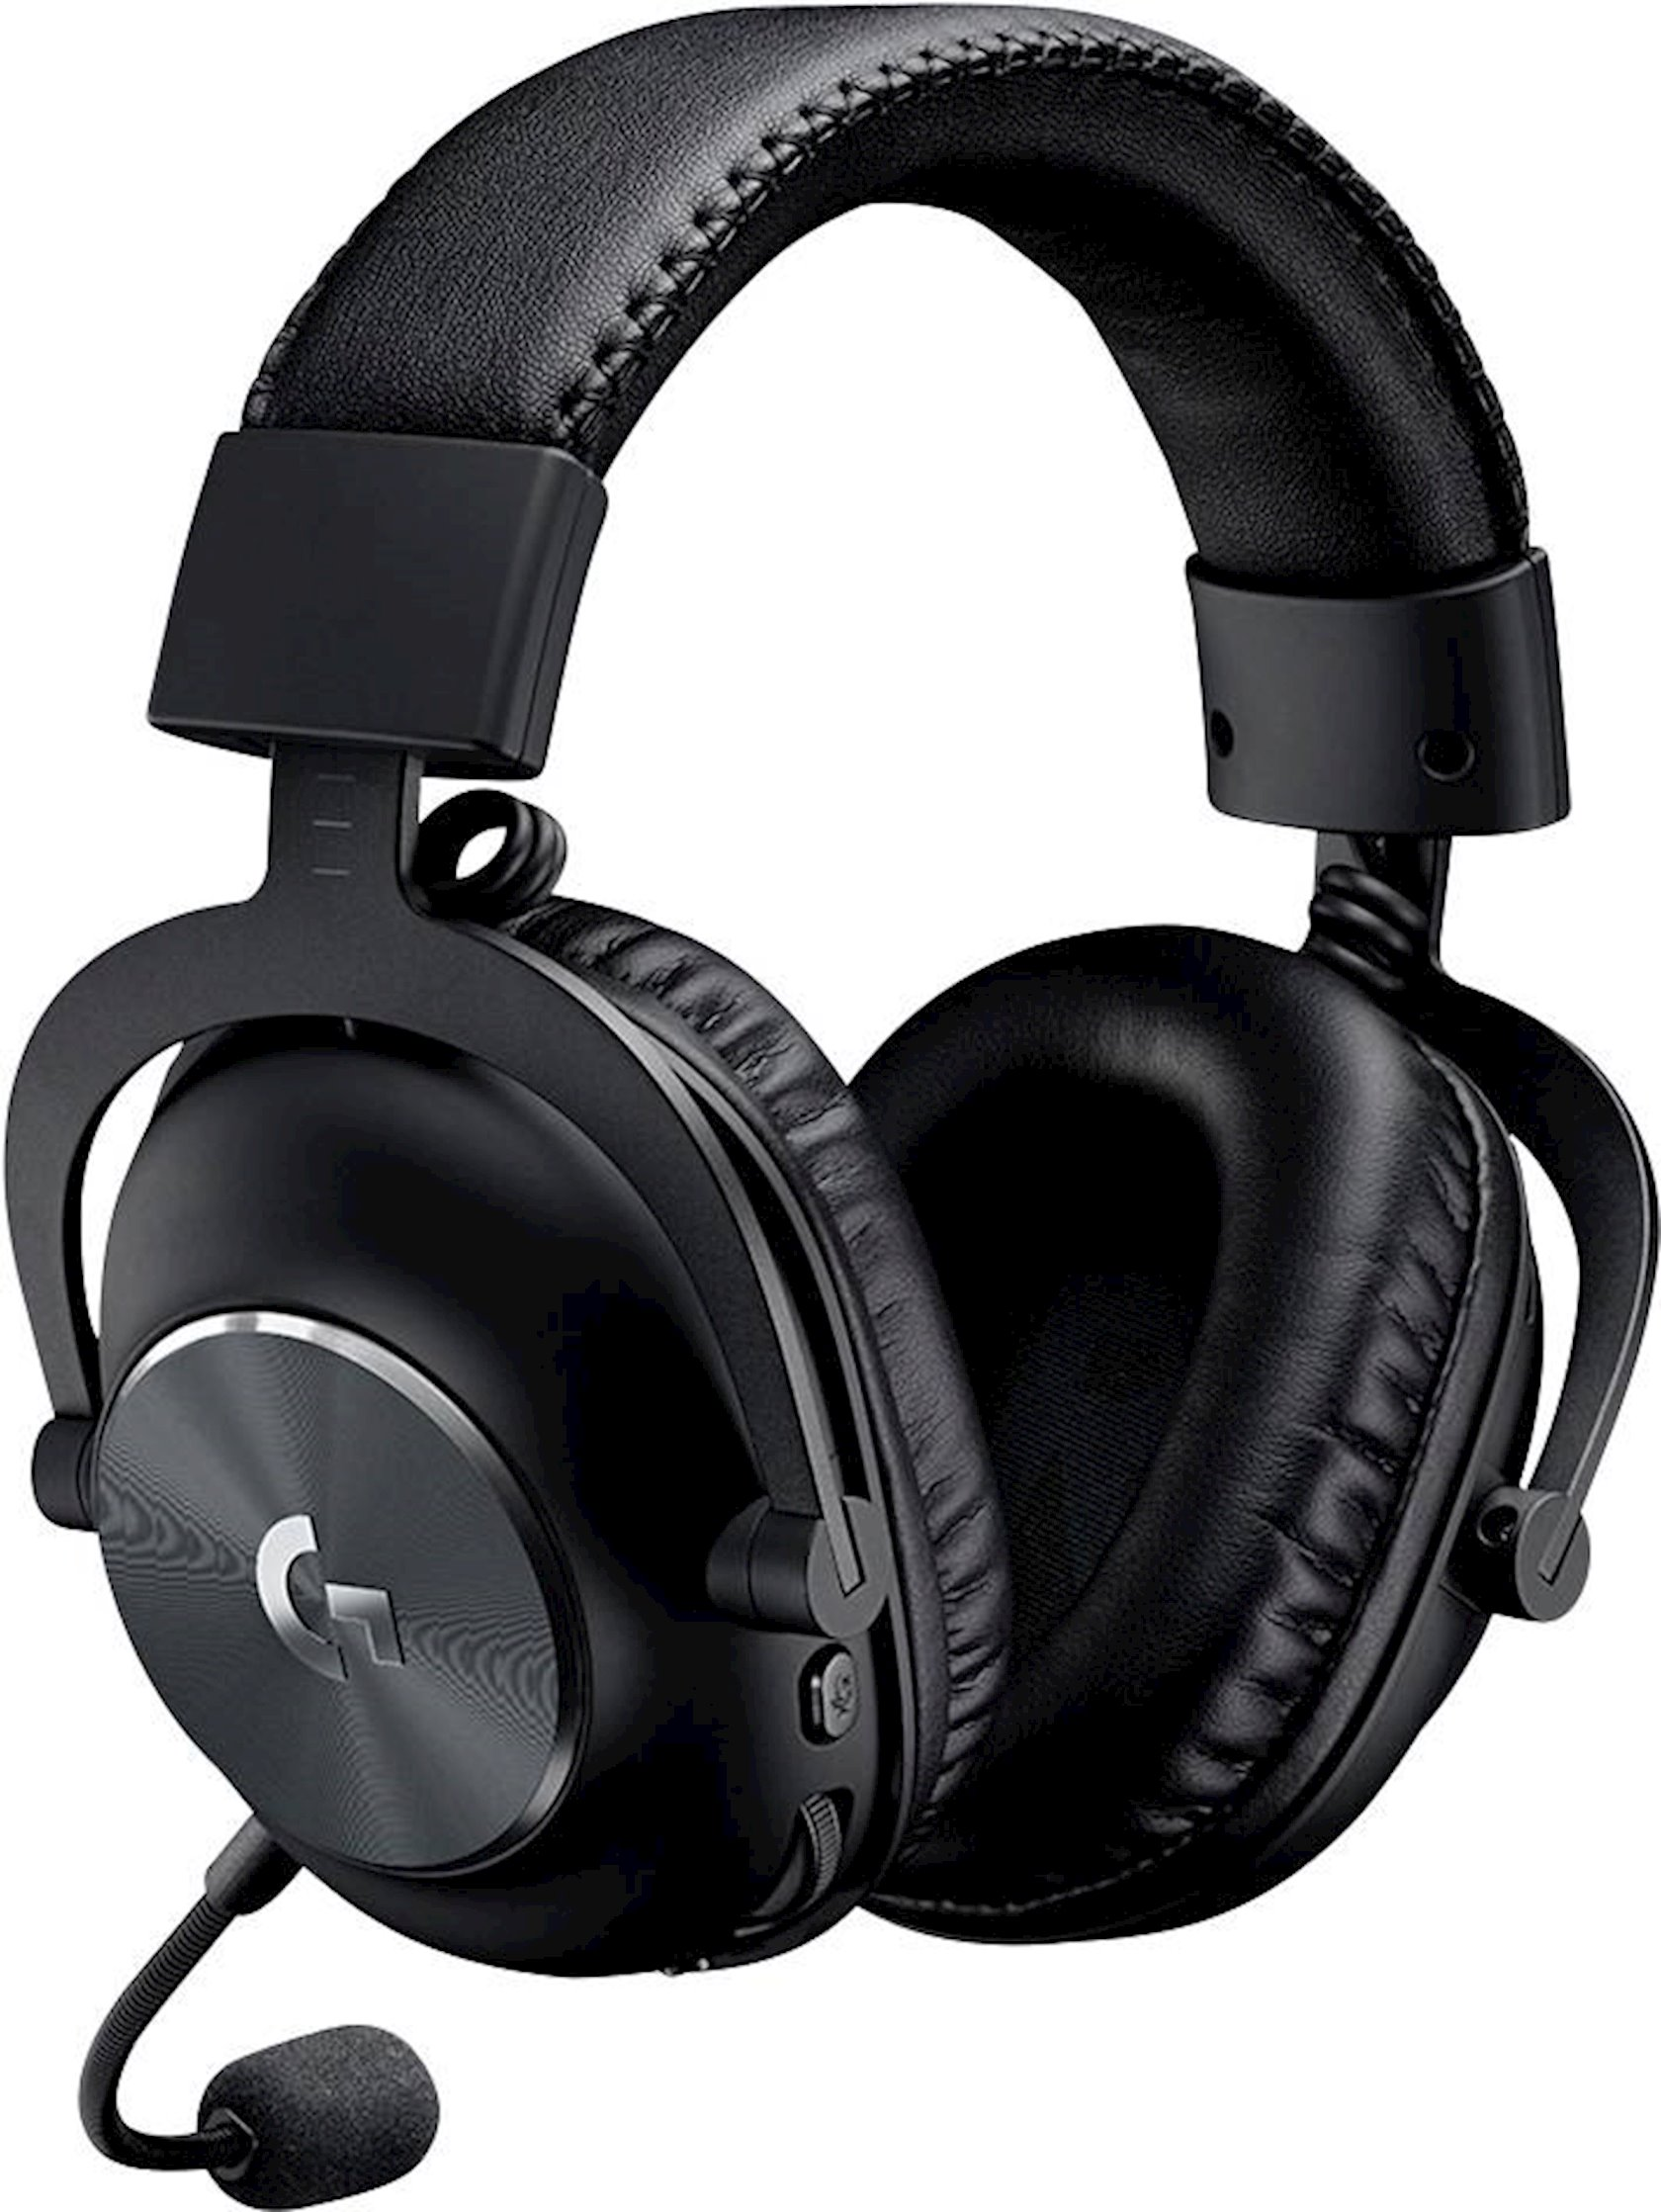 Simsiz qulaqlıq-qarnitur Logitech G Pro X Wireless Black